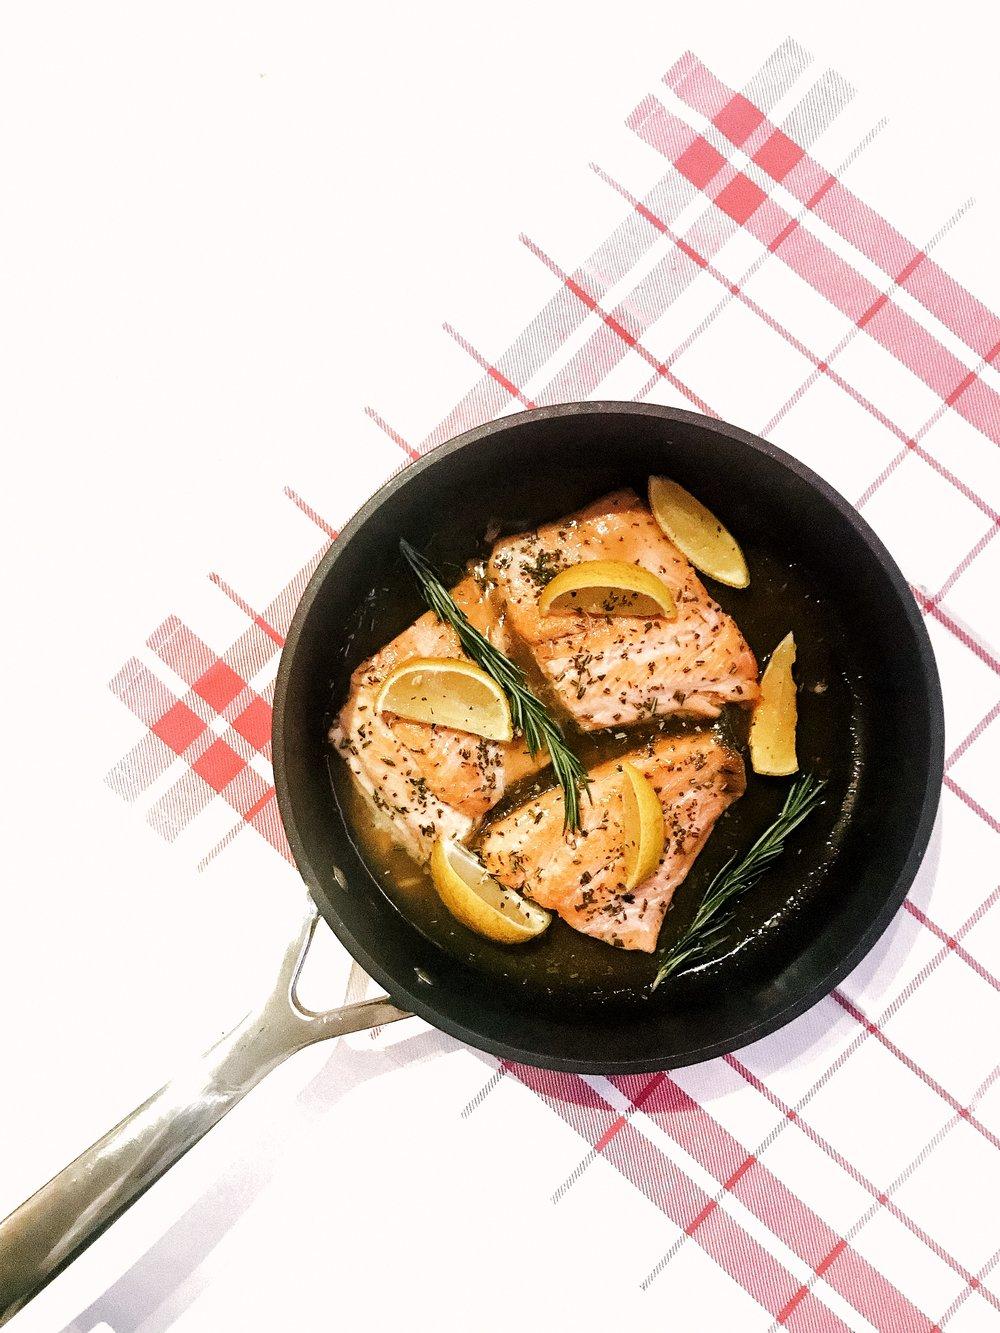 Lemon Rosemary Salmon (AIP, GAPS, Paleo, Gluten-Free, Dairy-Free)